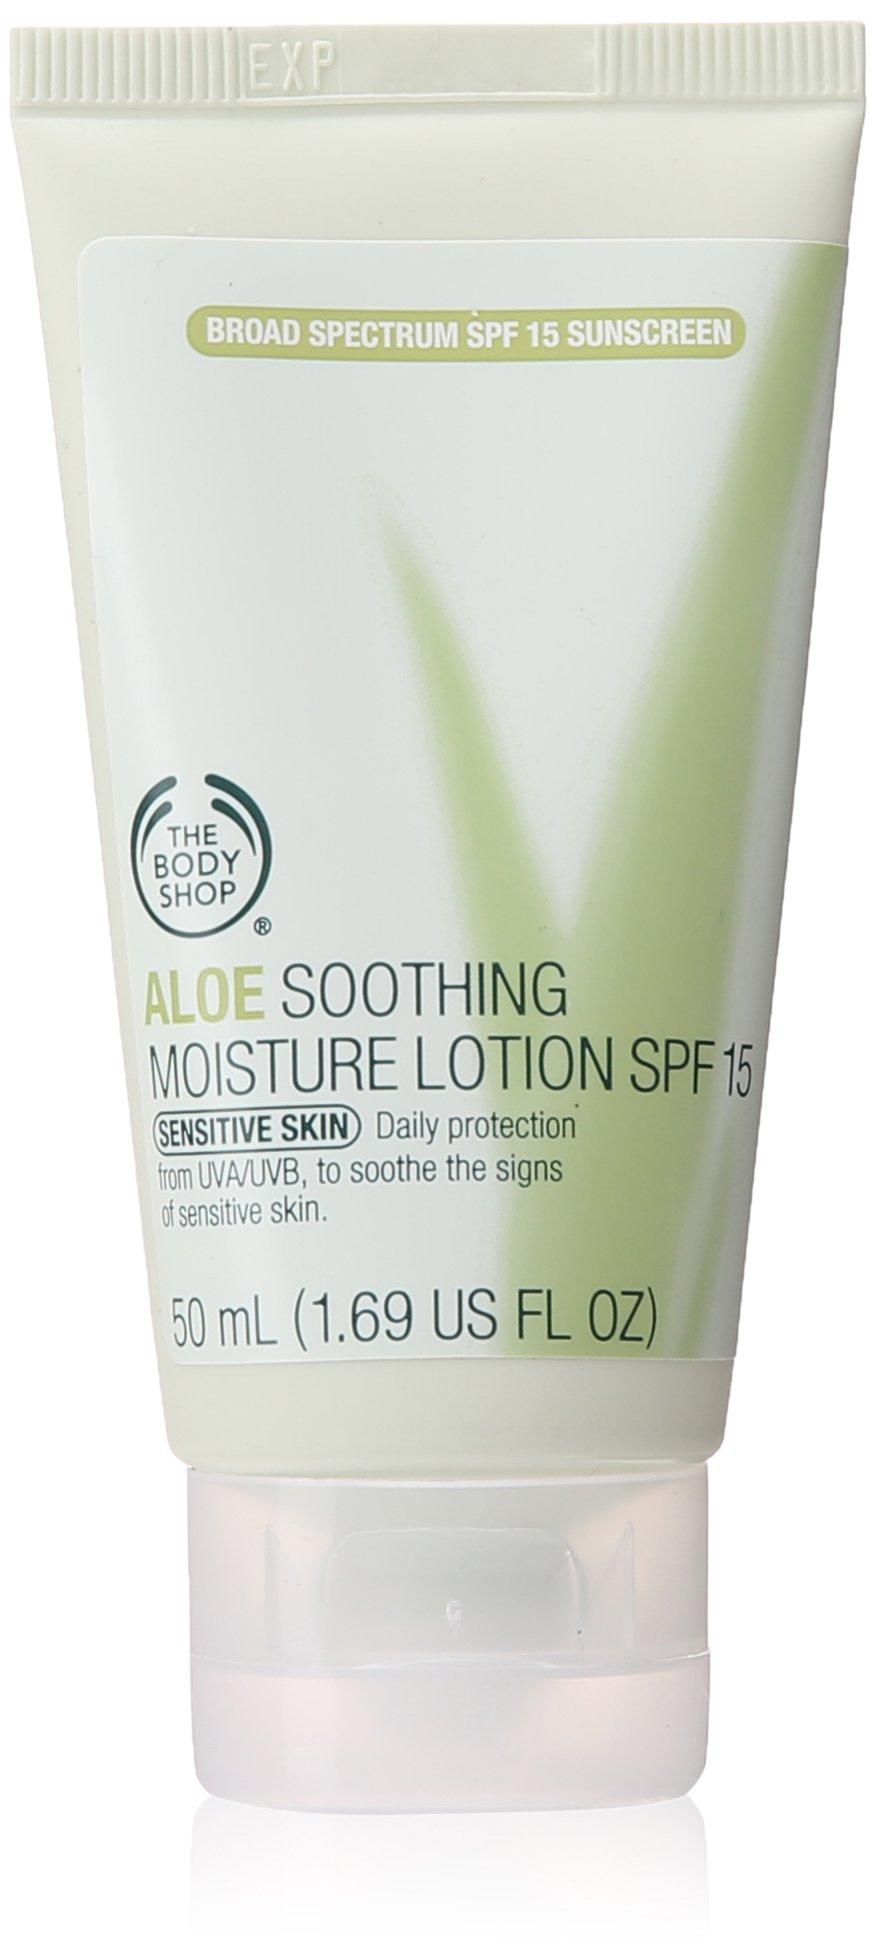 The Body Shop Aloe Soothing Moisture Lotion SPF 15, 1.69 Fluid Ounce